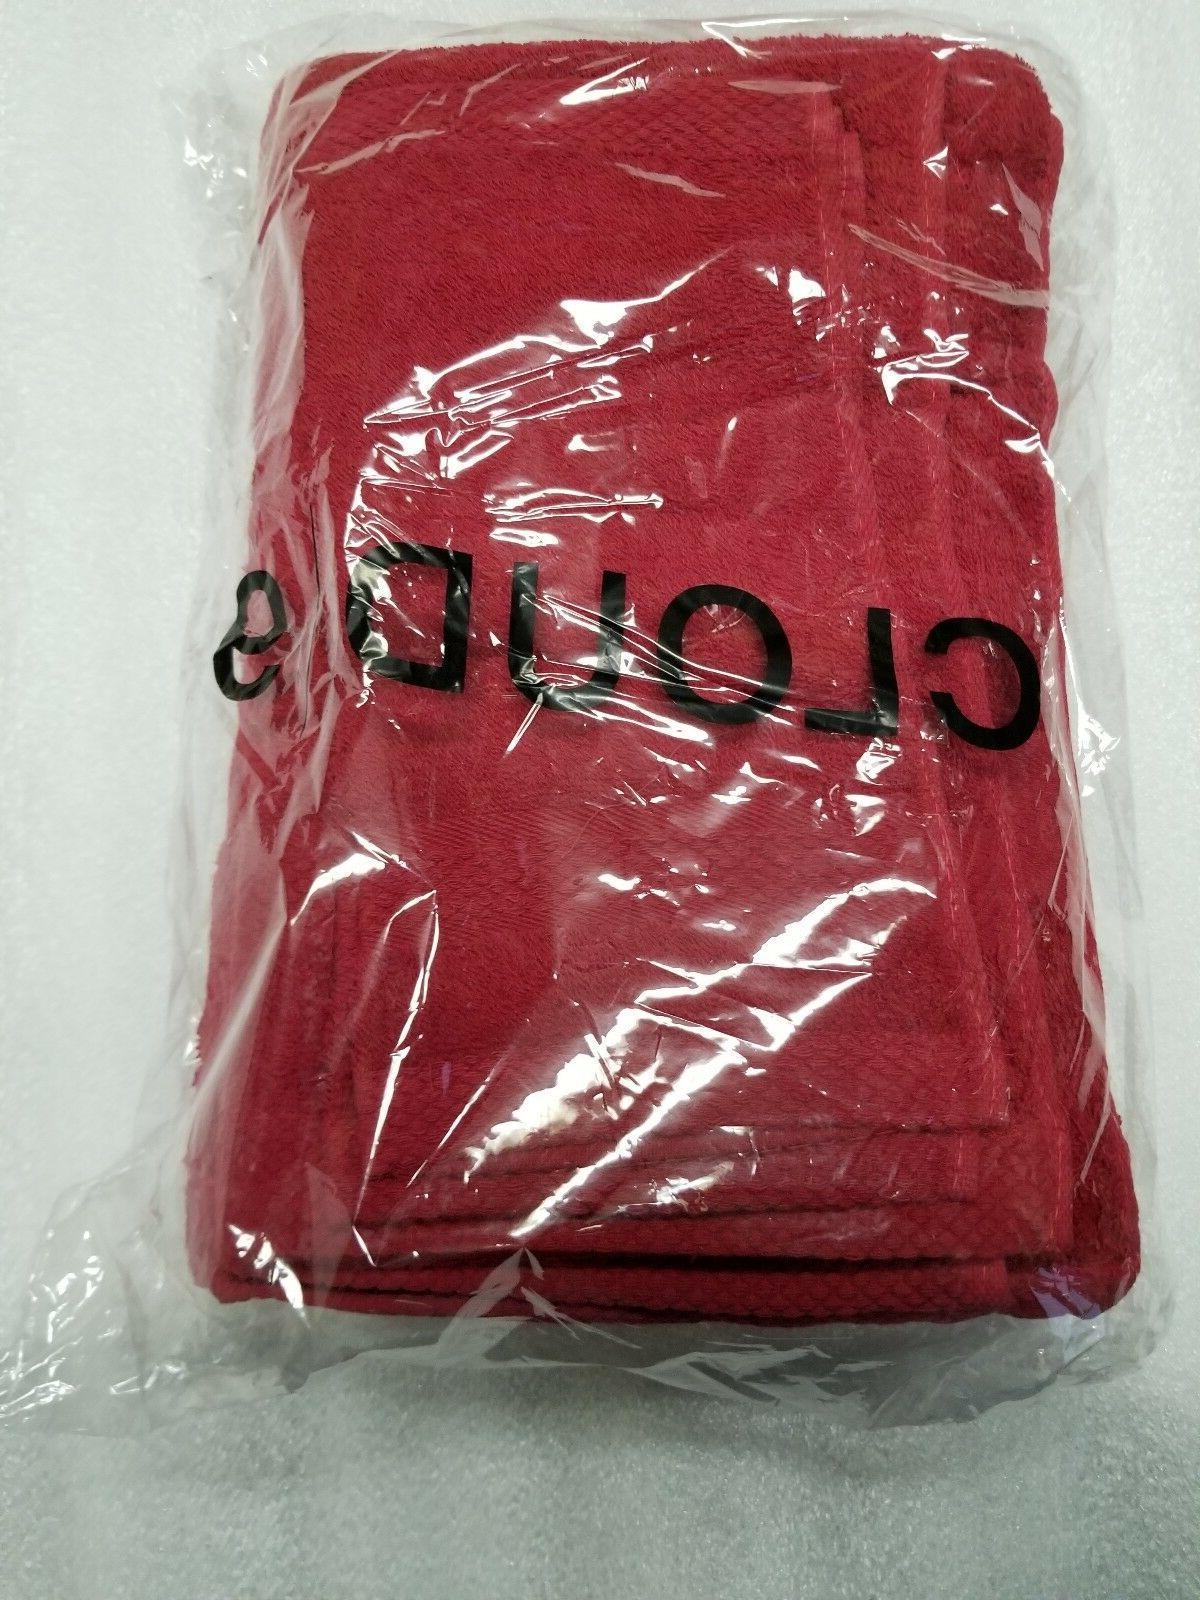 superior 900 gram egyptian cotton towels cranberry